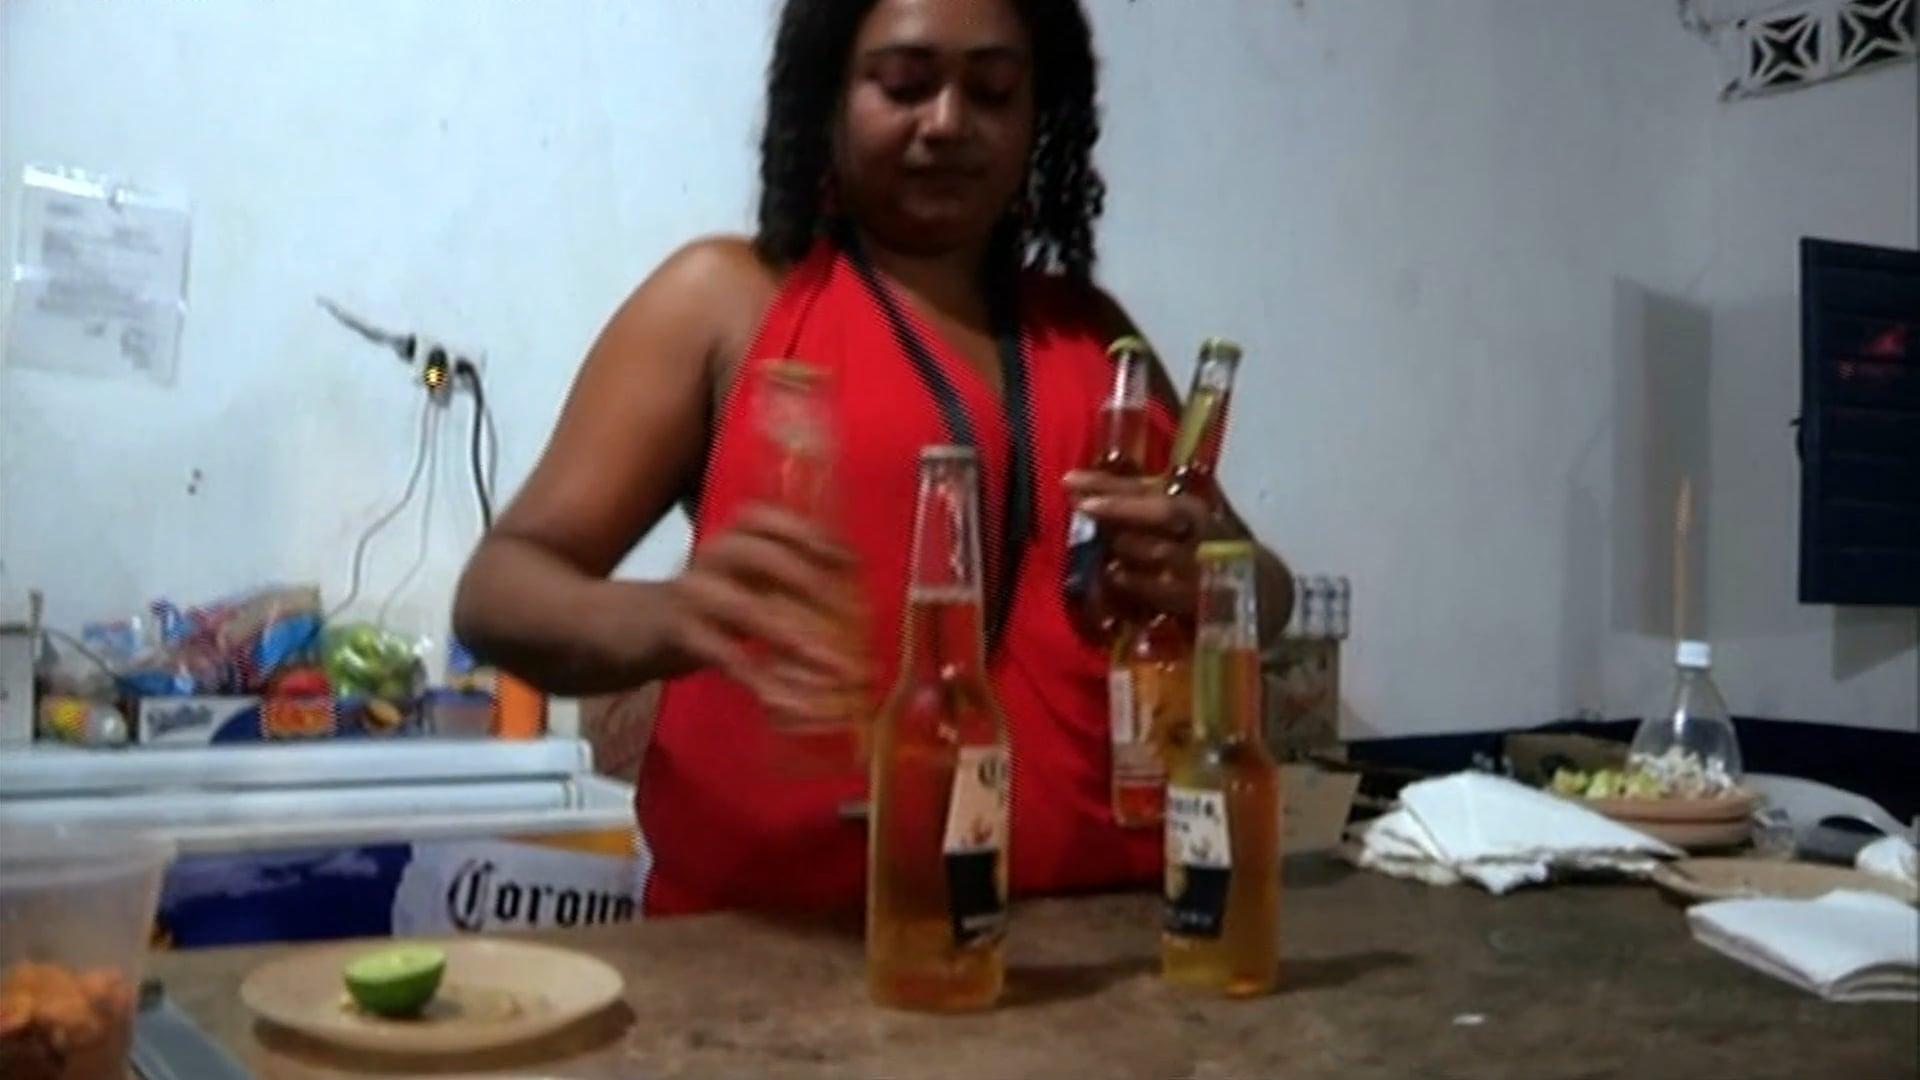 Unreported World- The Lost Girls of Honduras